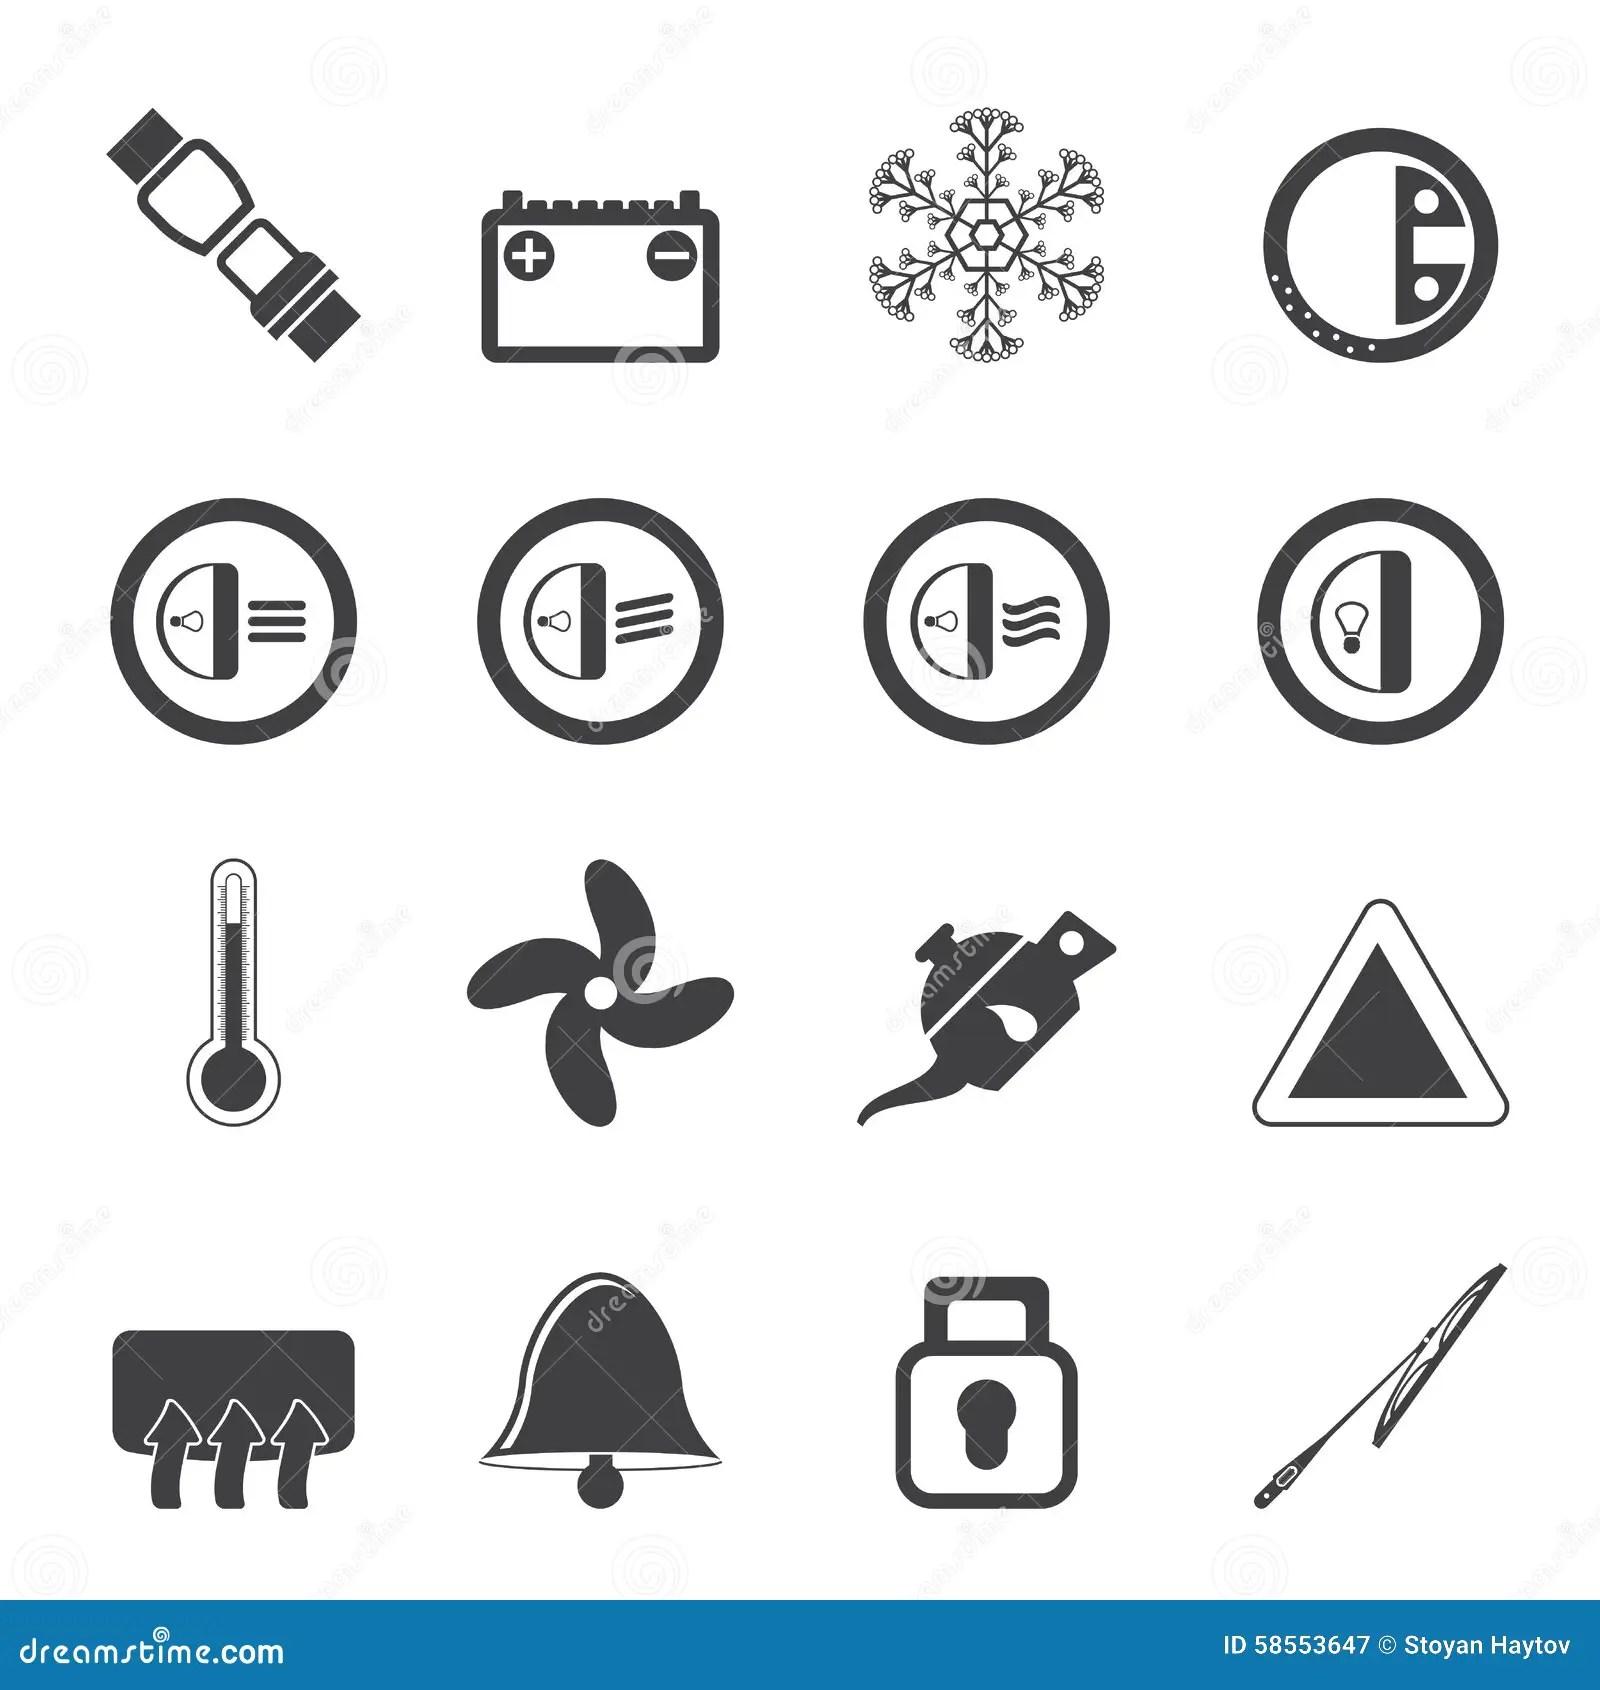 Dashboard Icons Vector Illustration